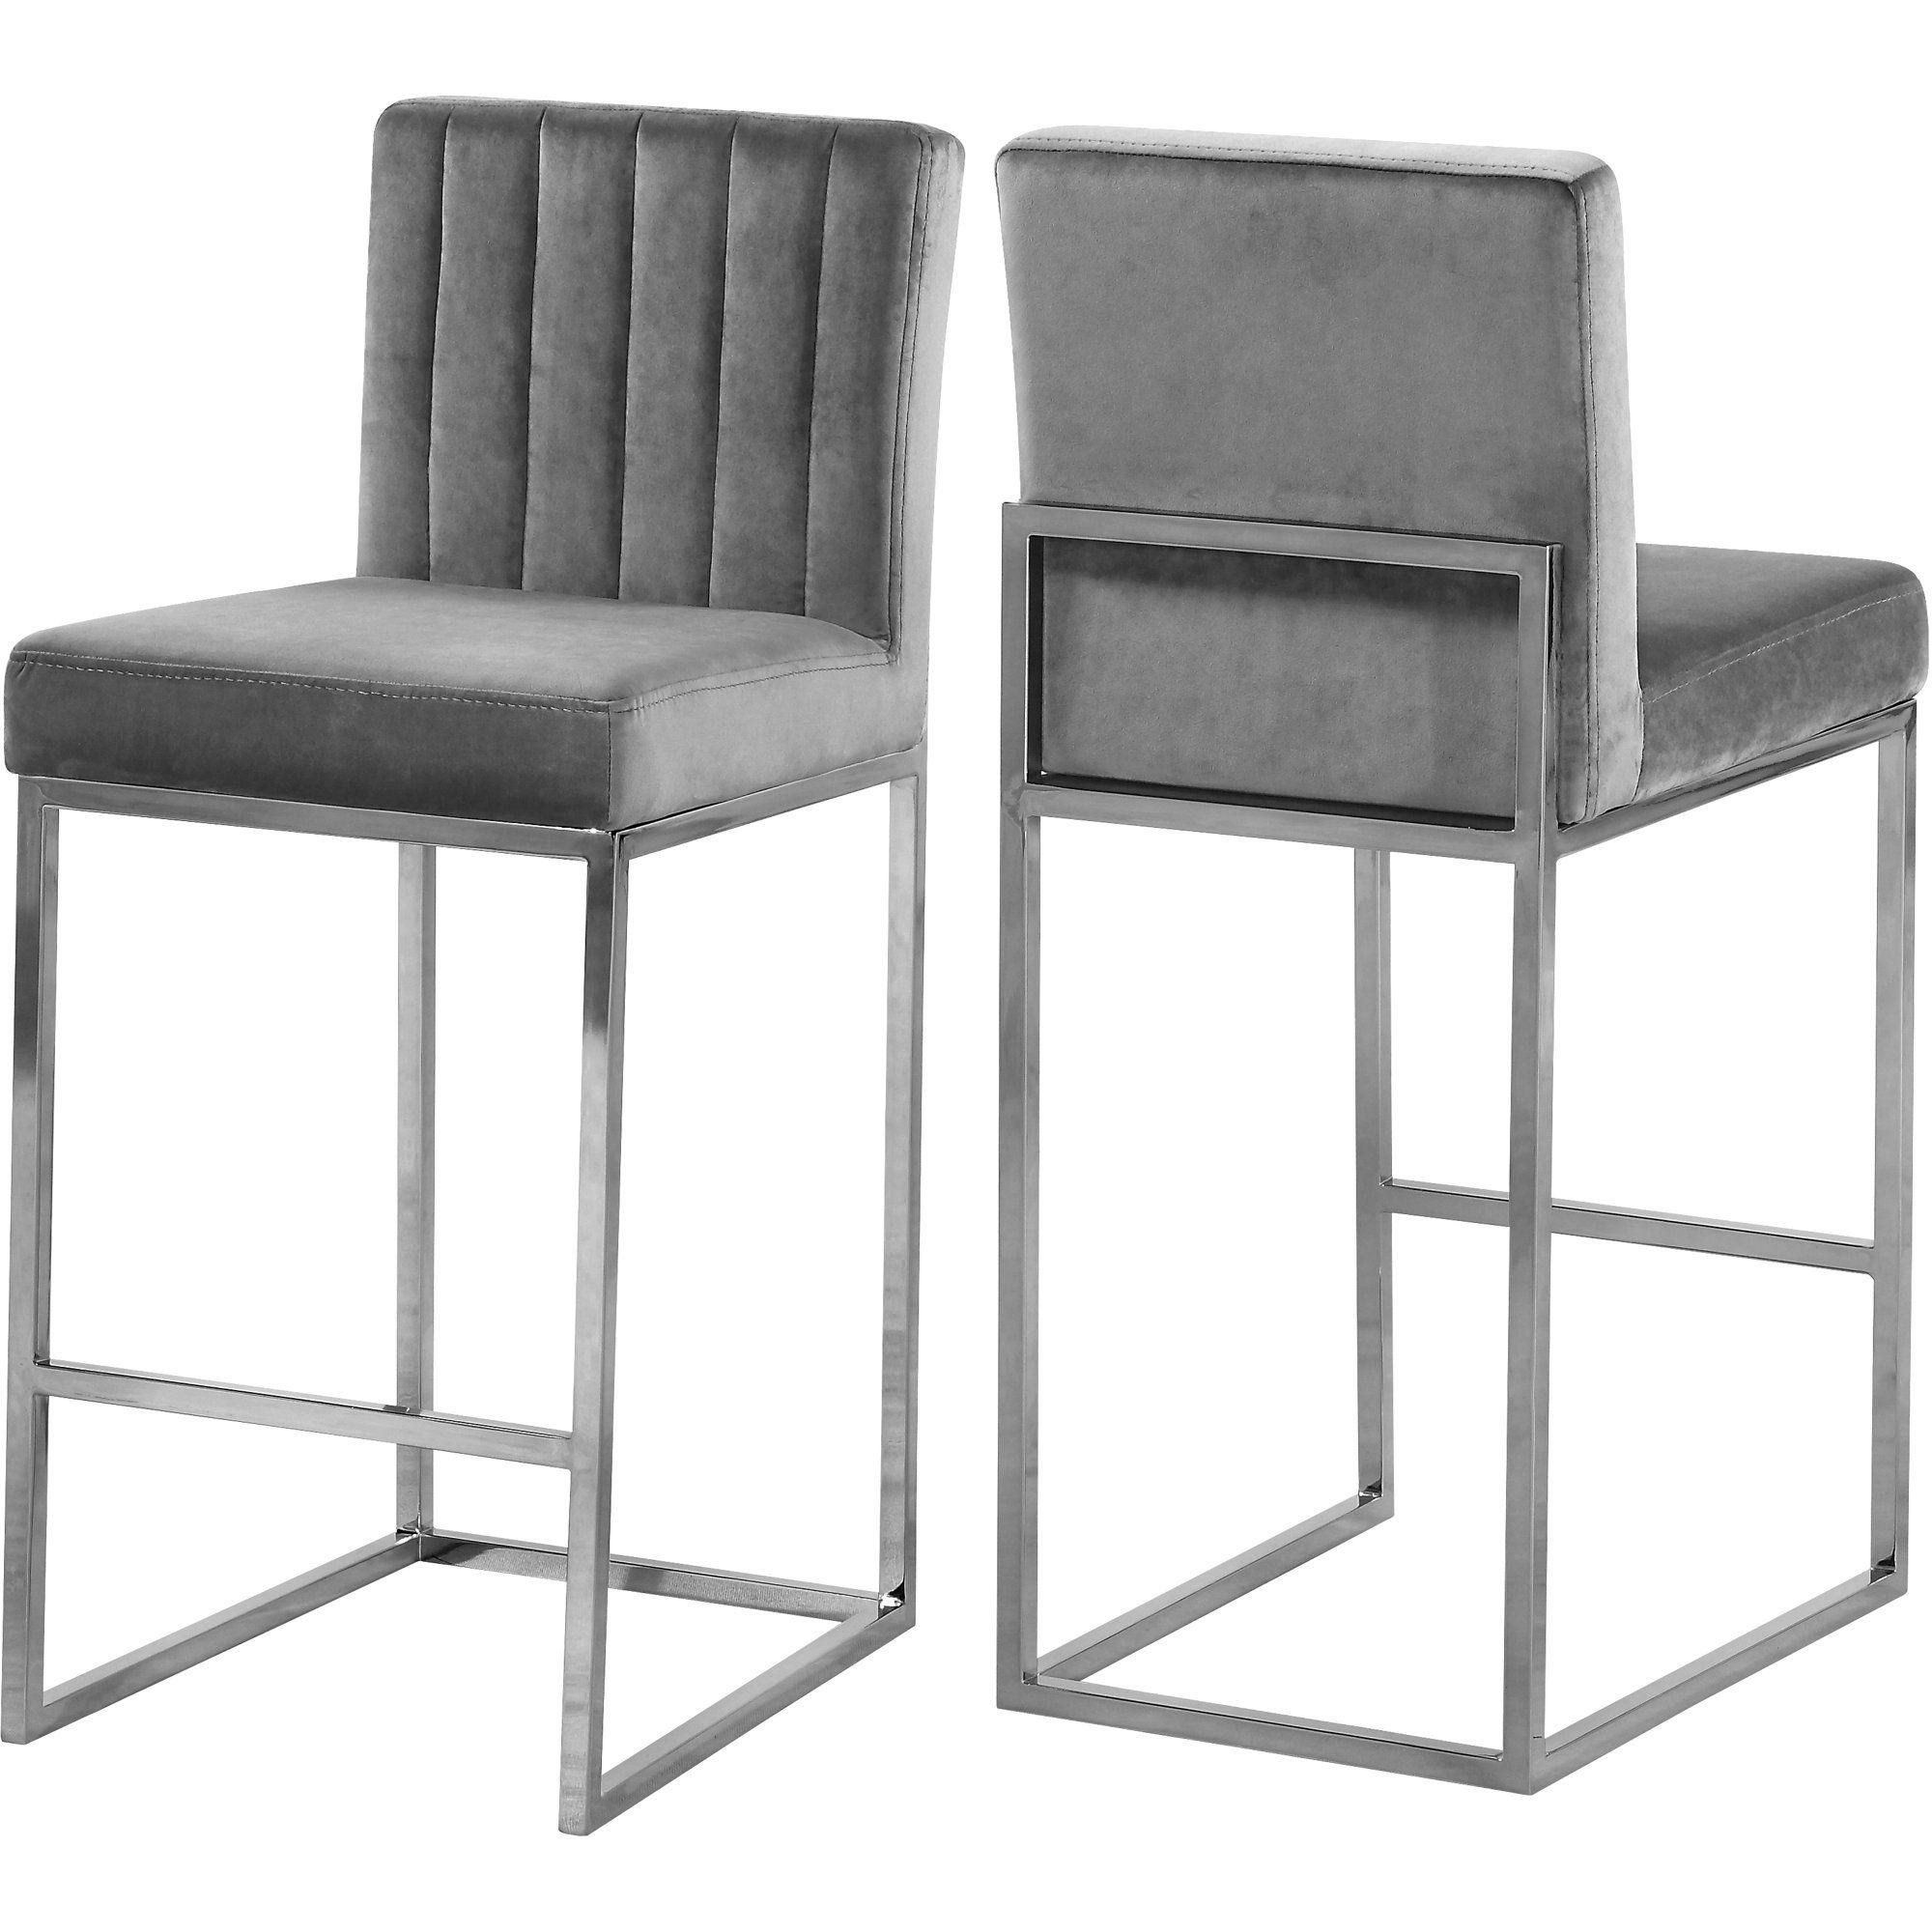 Giselle Grey Velvet Stool Color Grey Velvet Finish Chrome Style Contemporary Walmart Com In 2021 Grey Bar Stools Meridian Furniture Furniture